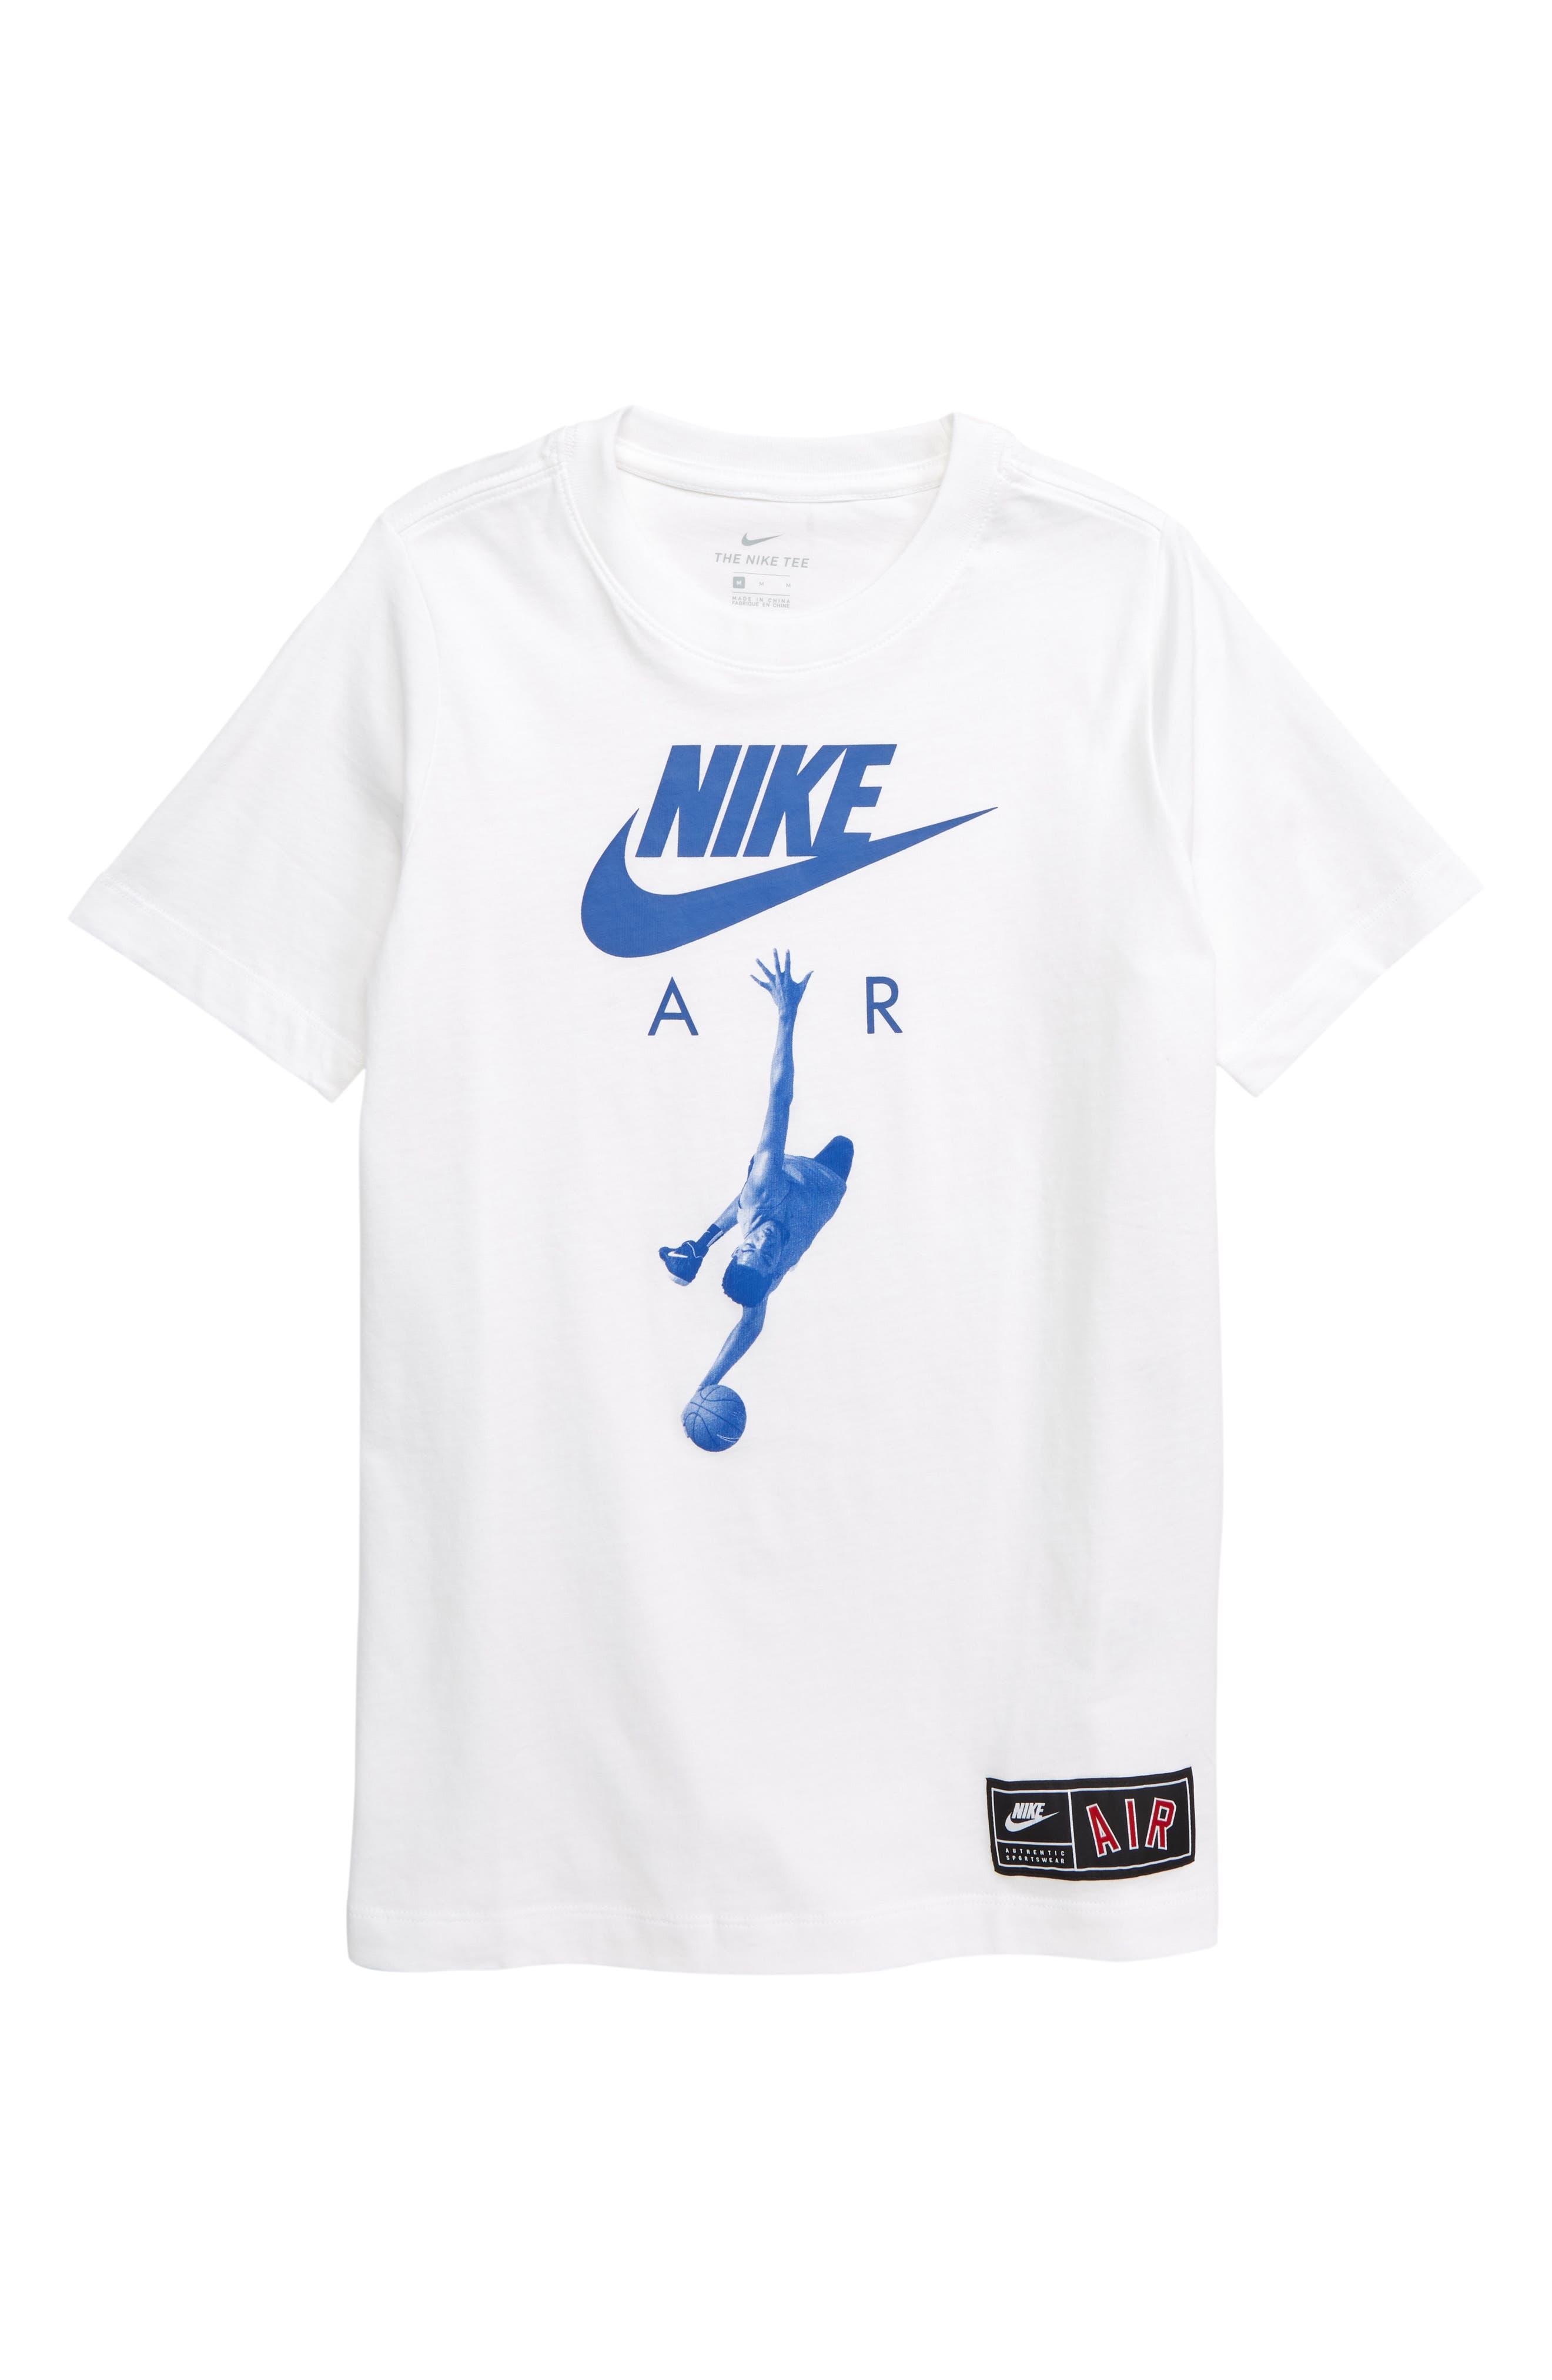 NIKE Air Dunk T-Shirt, Main, color, WHITE/ GAME ROYAL